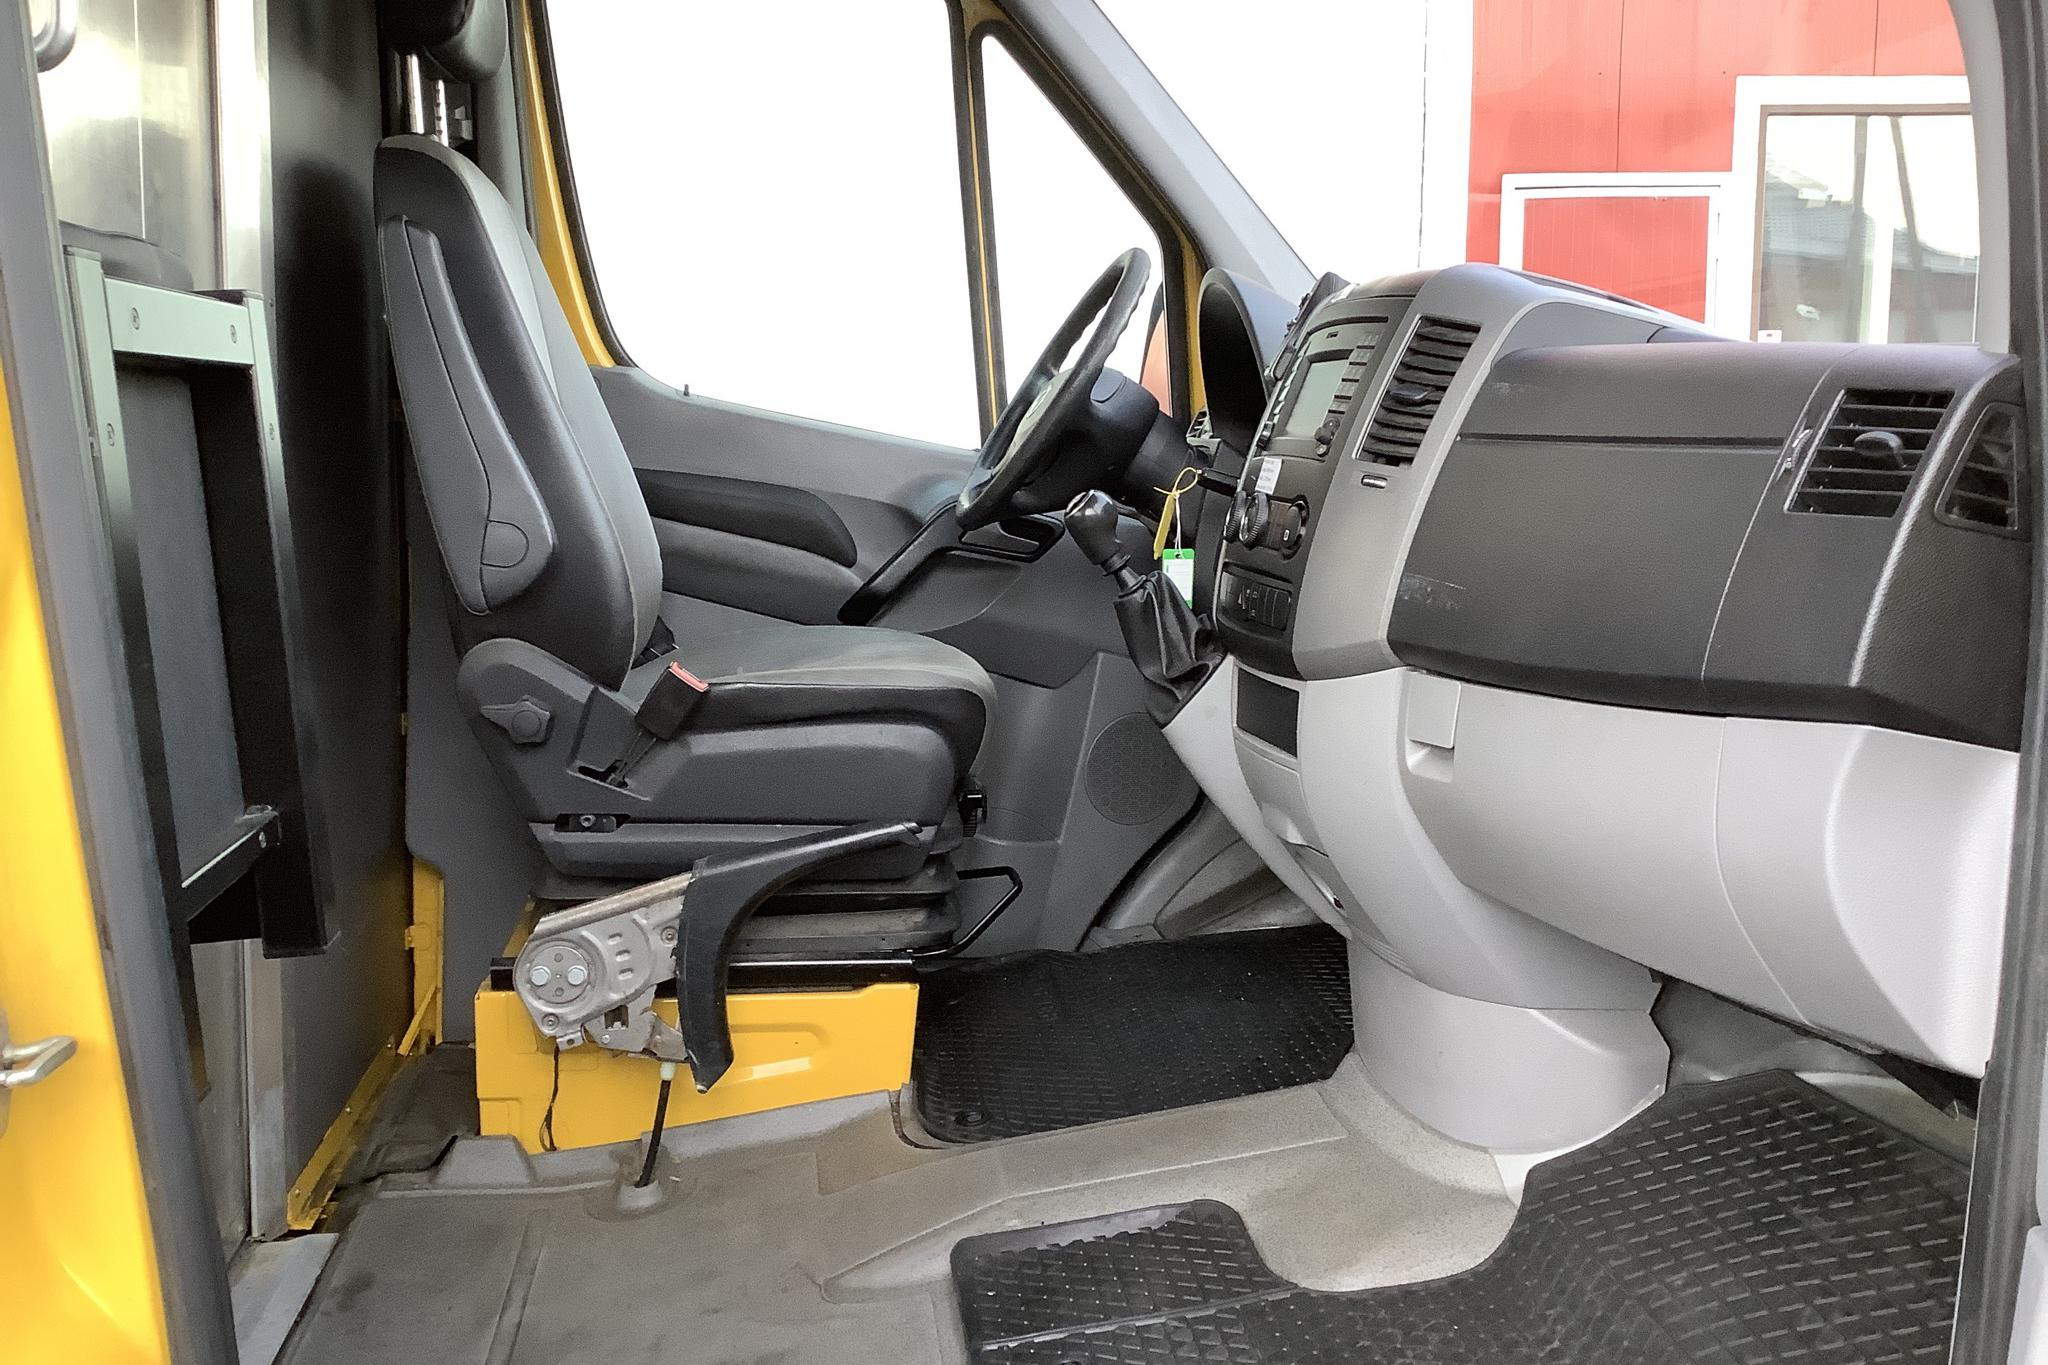 VW Crafter 35 2.0 TDI Skåp (136hk) - 146 050 km - Manual - Light Yellow - 2016